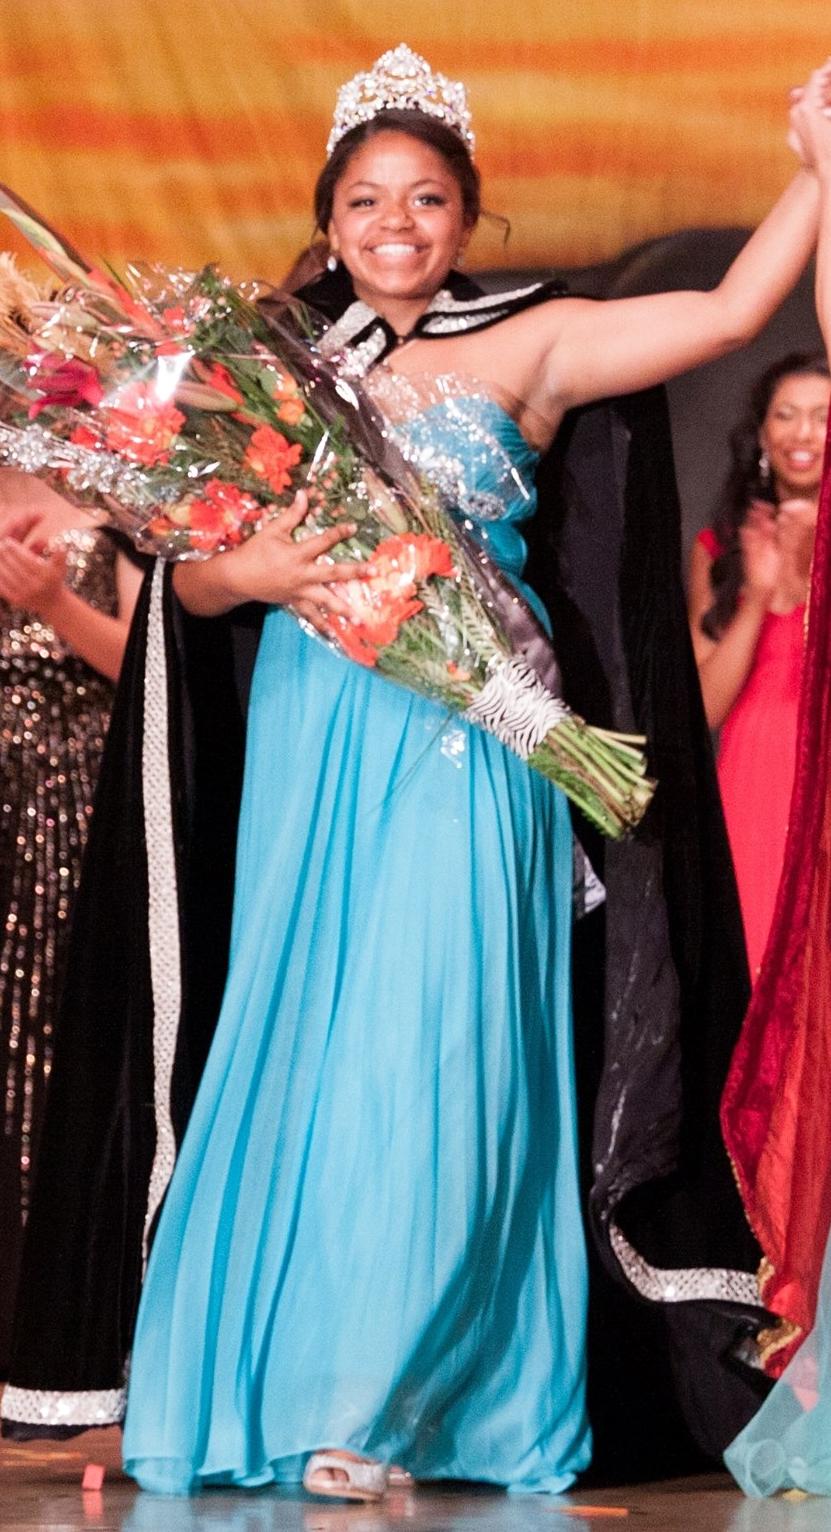 Madison Coleman, Miss Teen Vista 2014